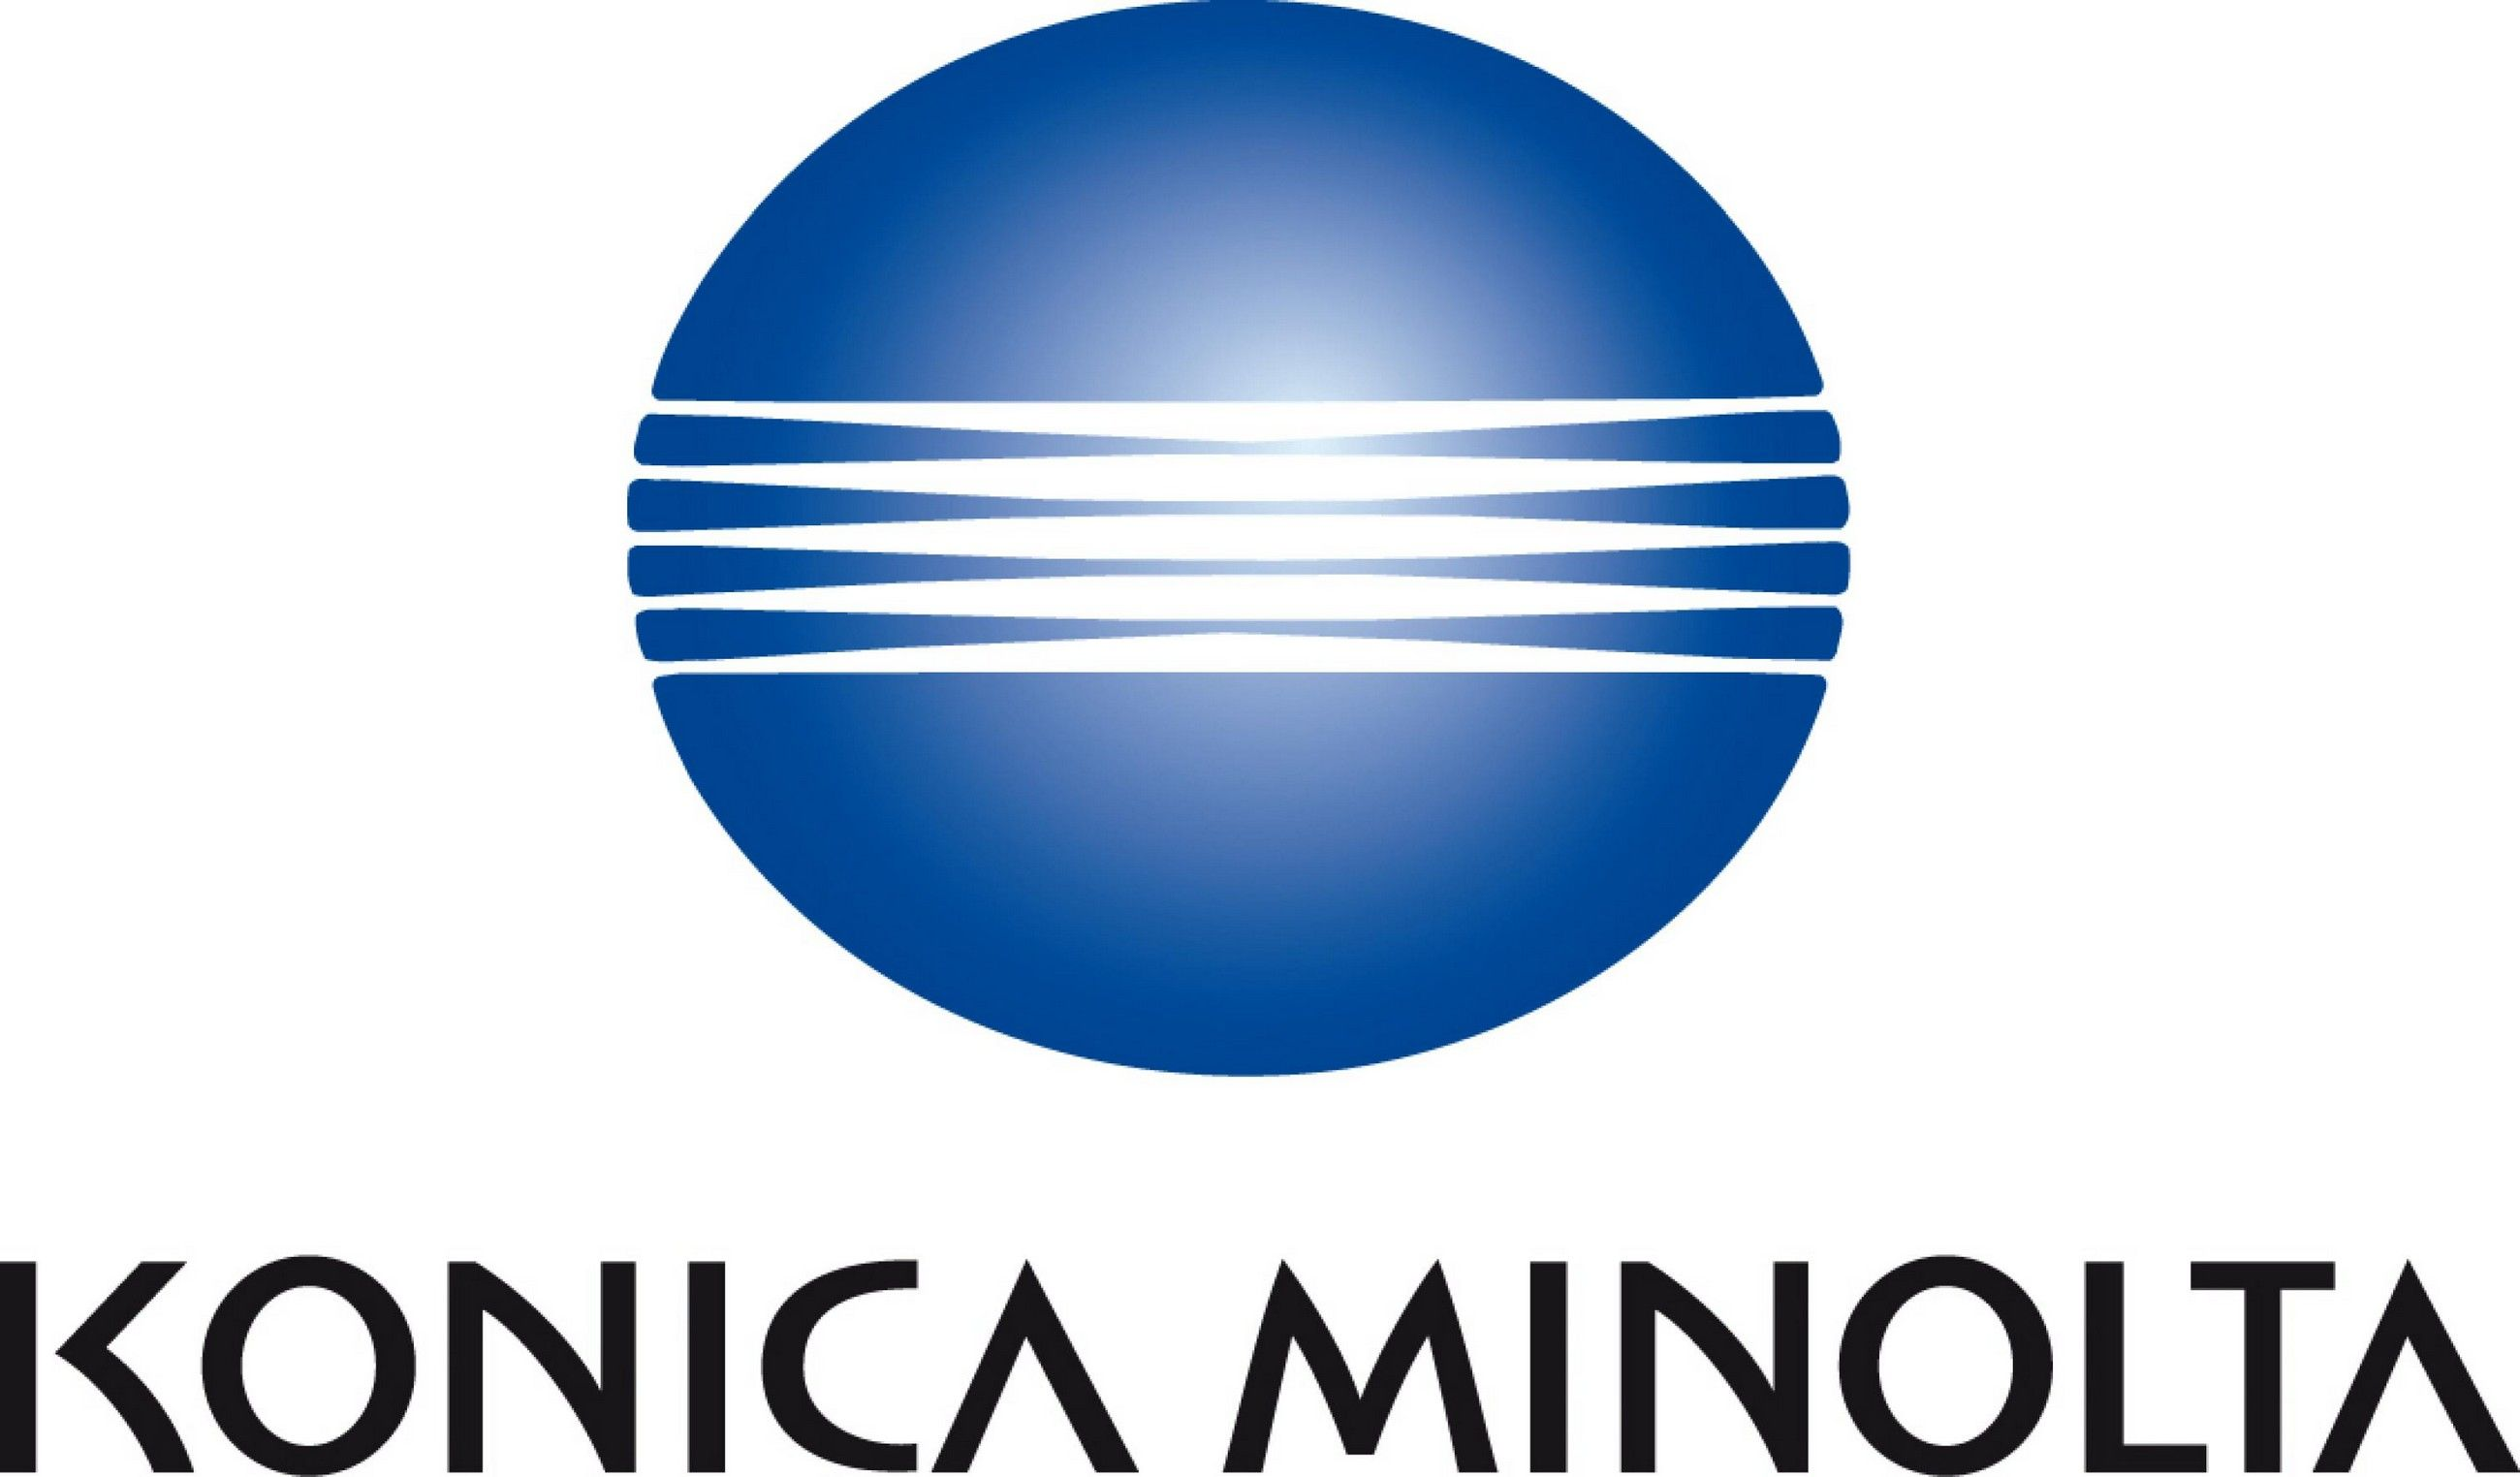 Konica Minolta Logo [AIPDF] Konica minolta, Monitor for photo editing, Toner cartridge